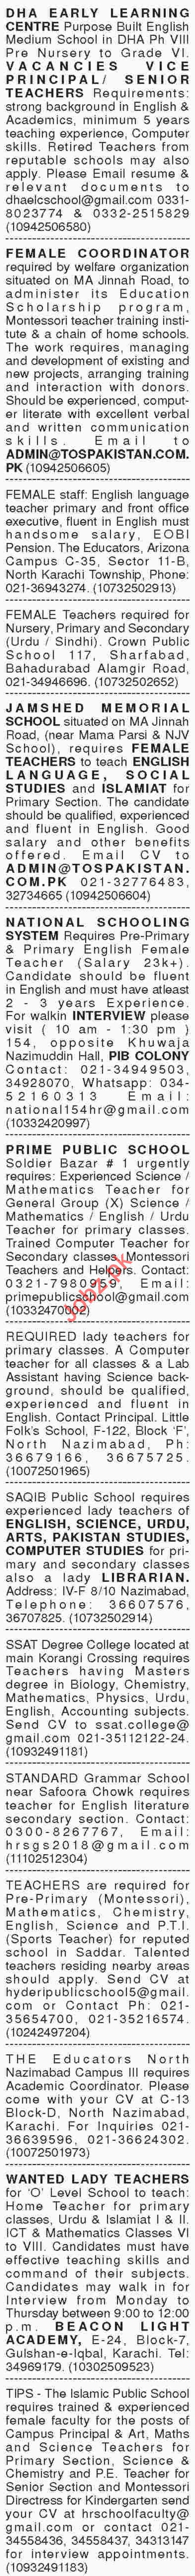 Dawn Sunday Newspaper Classified Teaching Jobs 2018